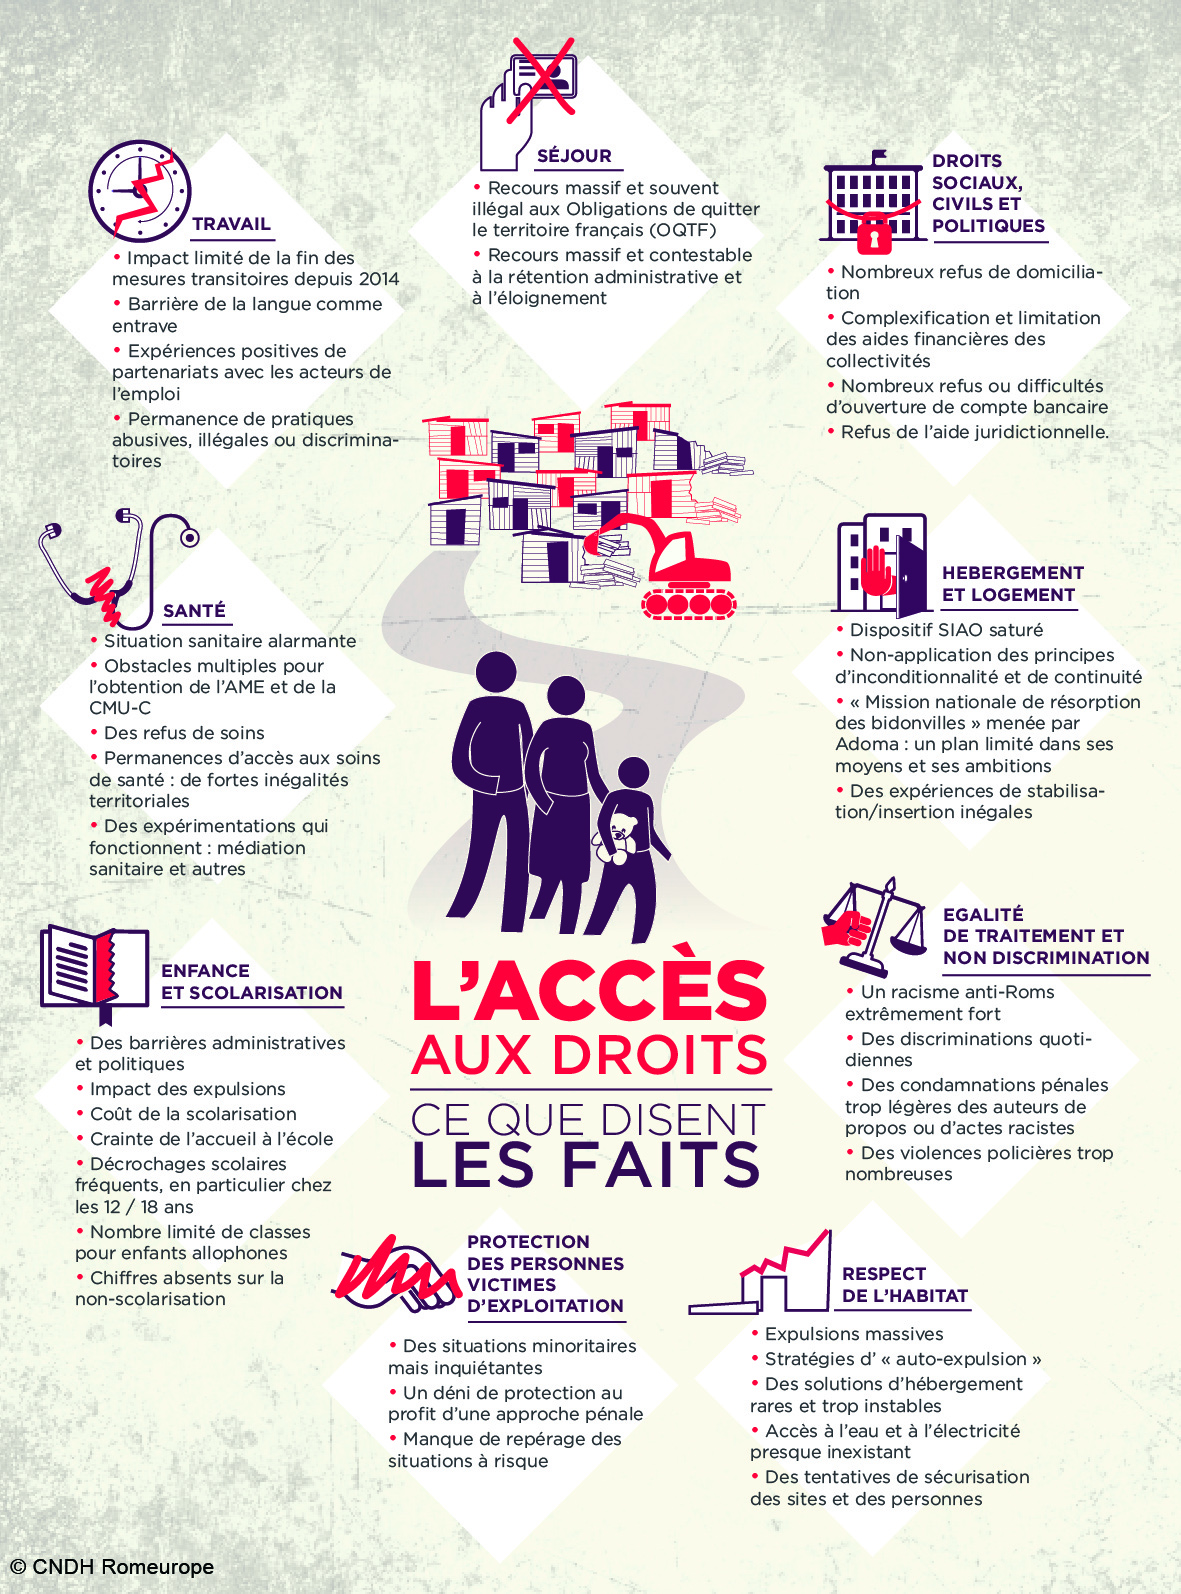 infographie_romeurope_-_les_faits.jpg